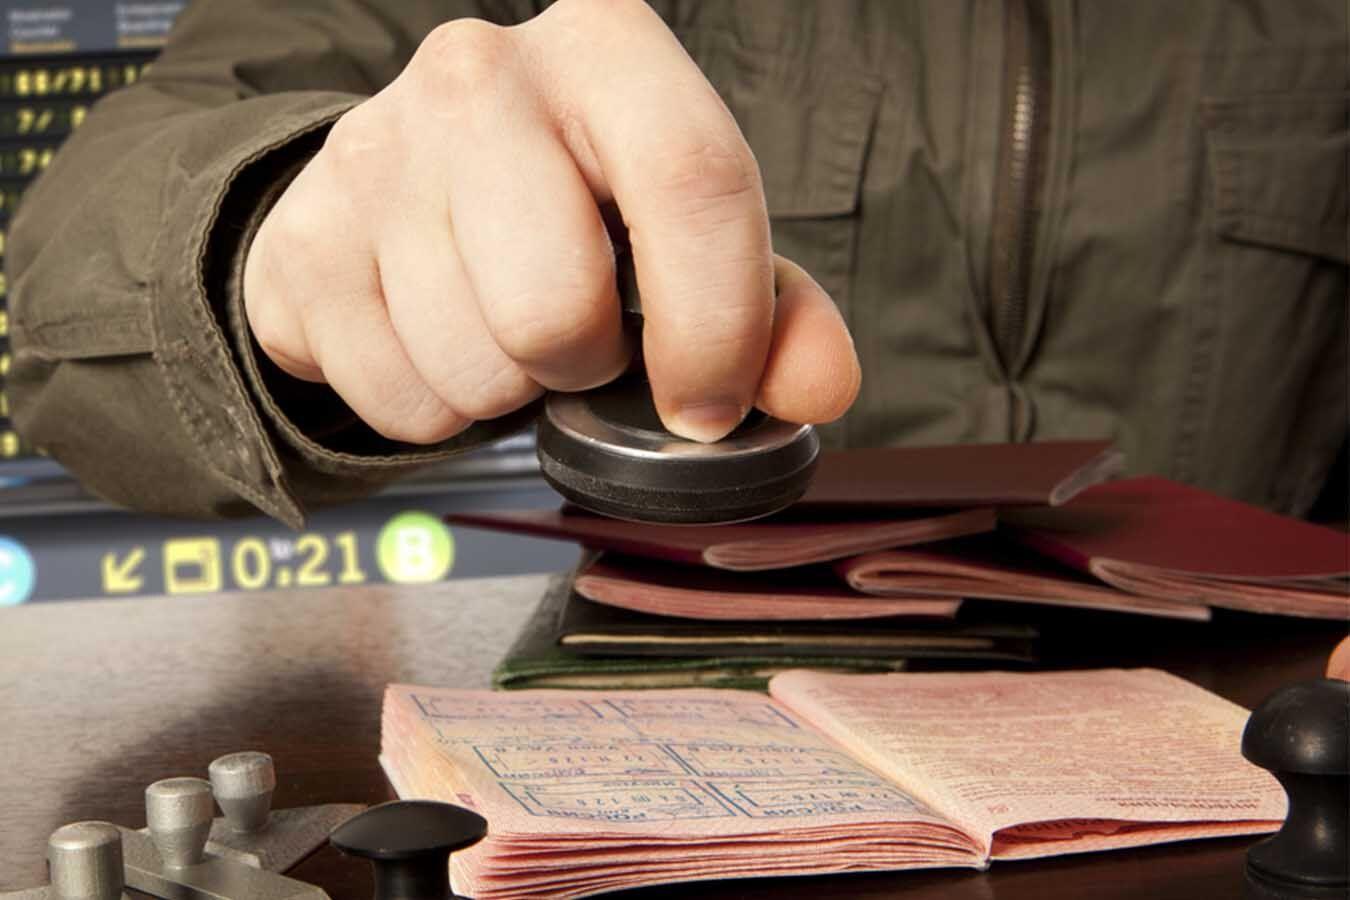 pasaport basvuru - Elektronik Pasaport (E-Pasaport) Nedir?